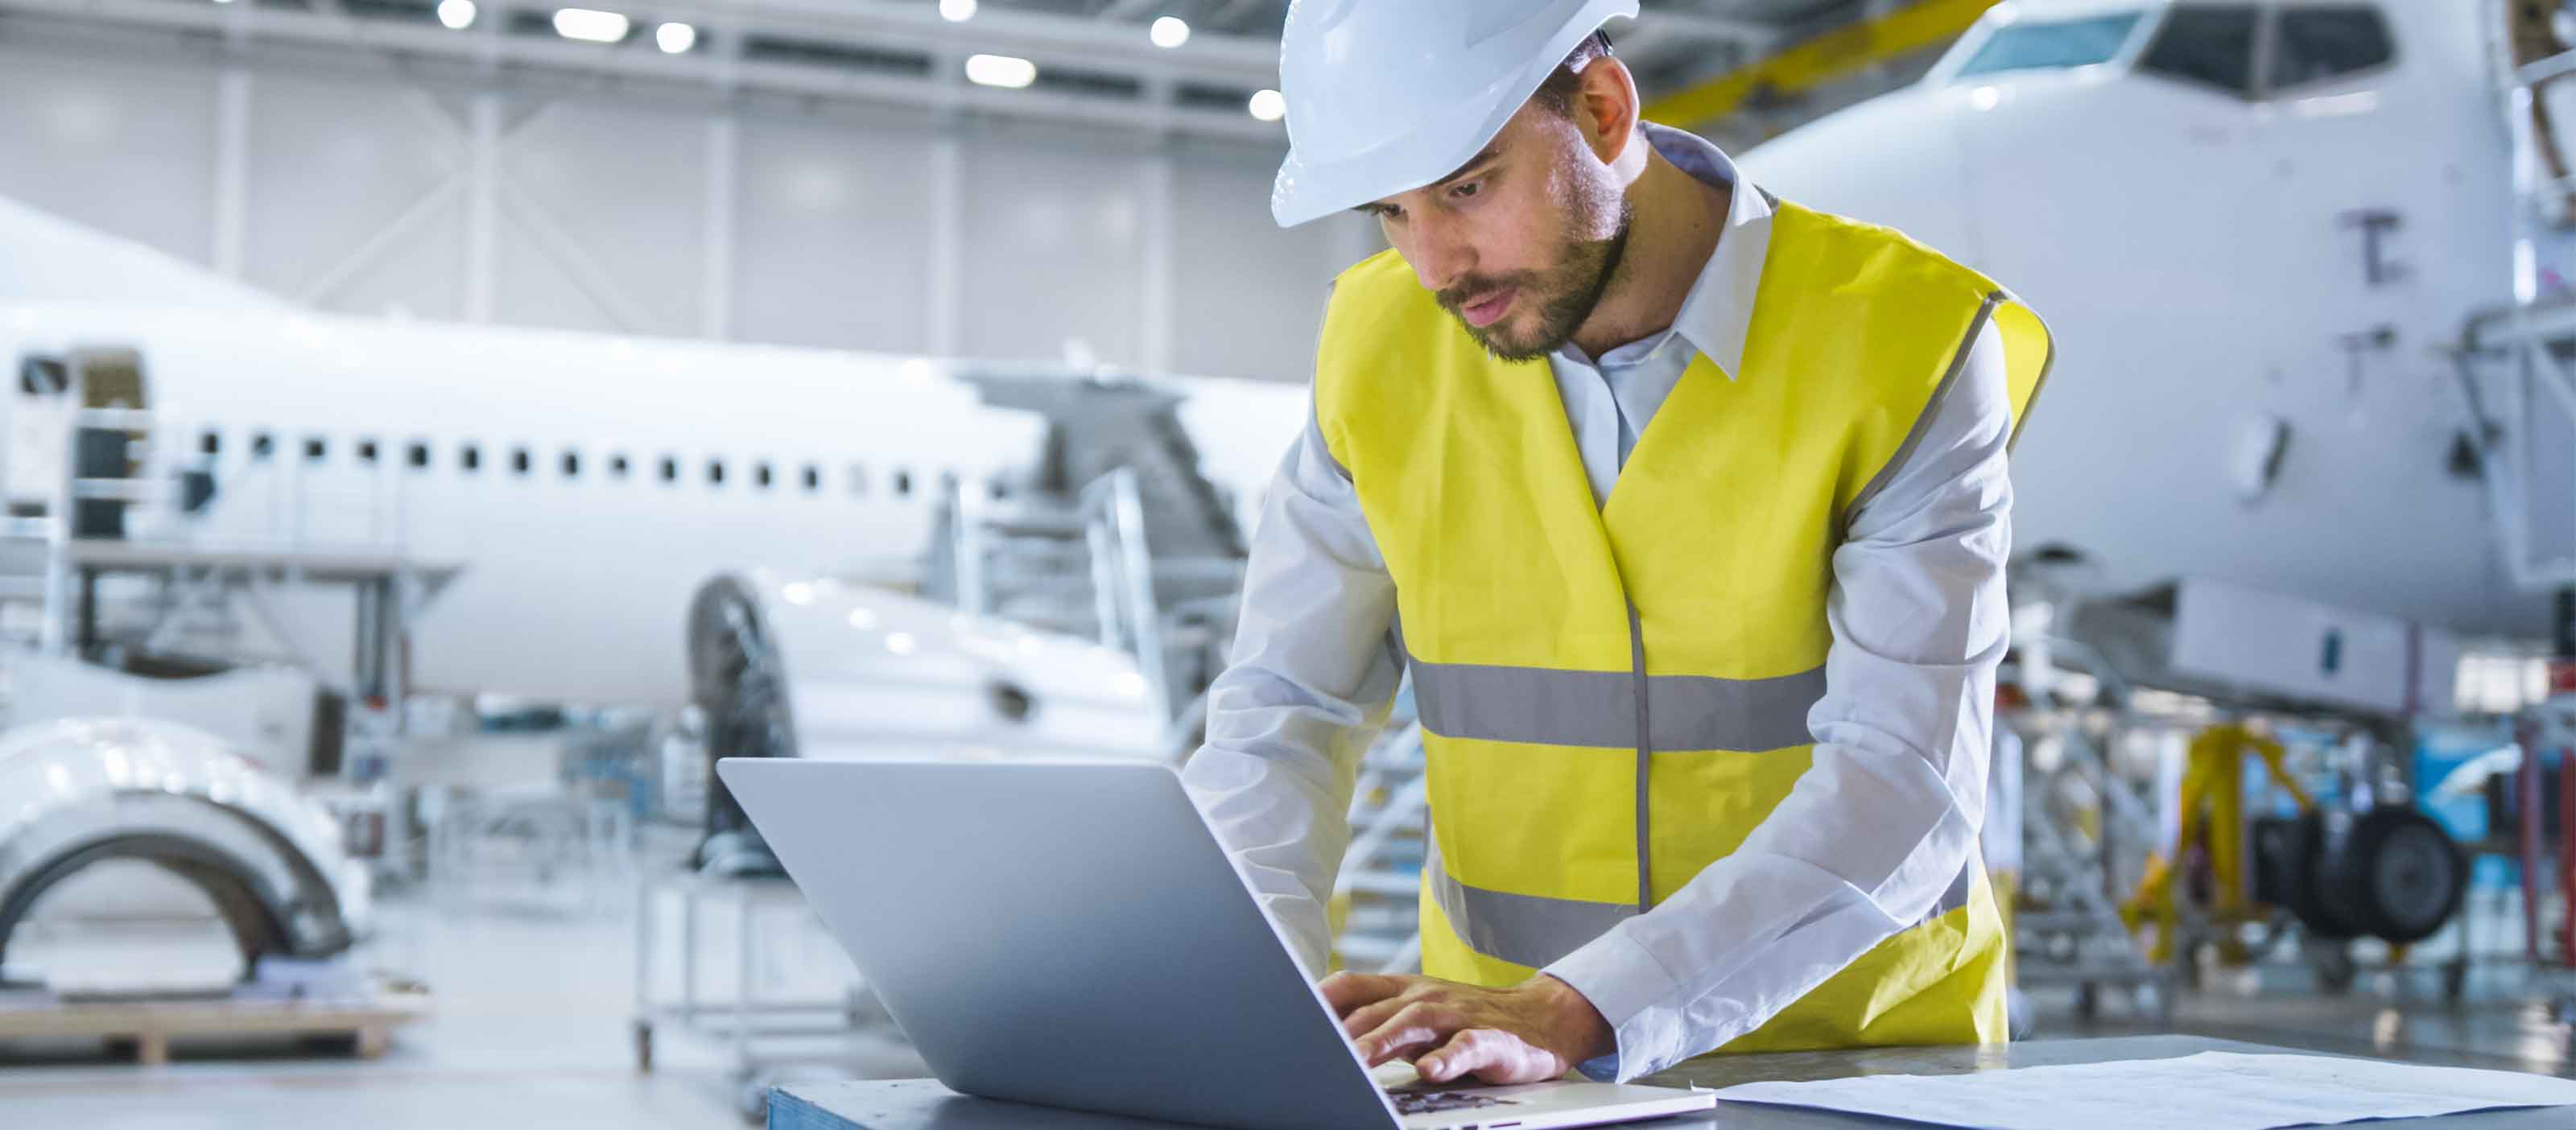 Aviation engineer using GE Digital software